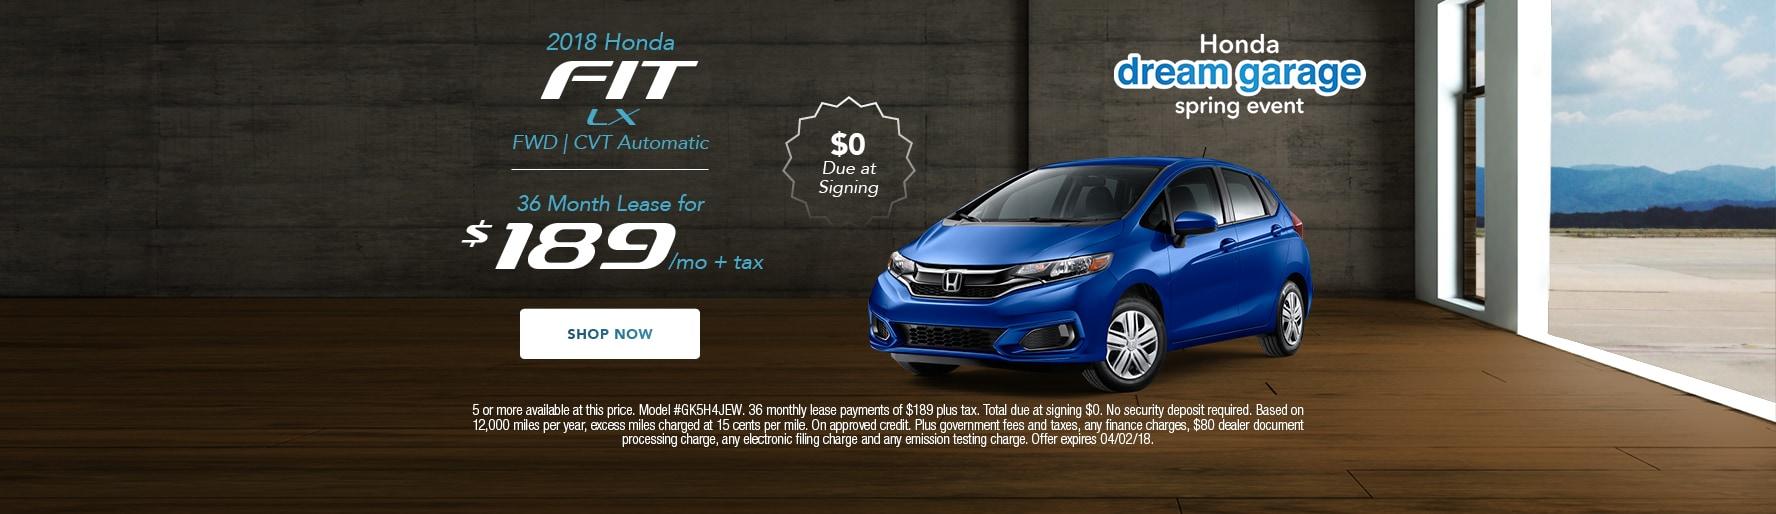 New used honda dealer in san diego dch honda of for Honda dealership san diego ca